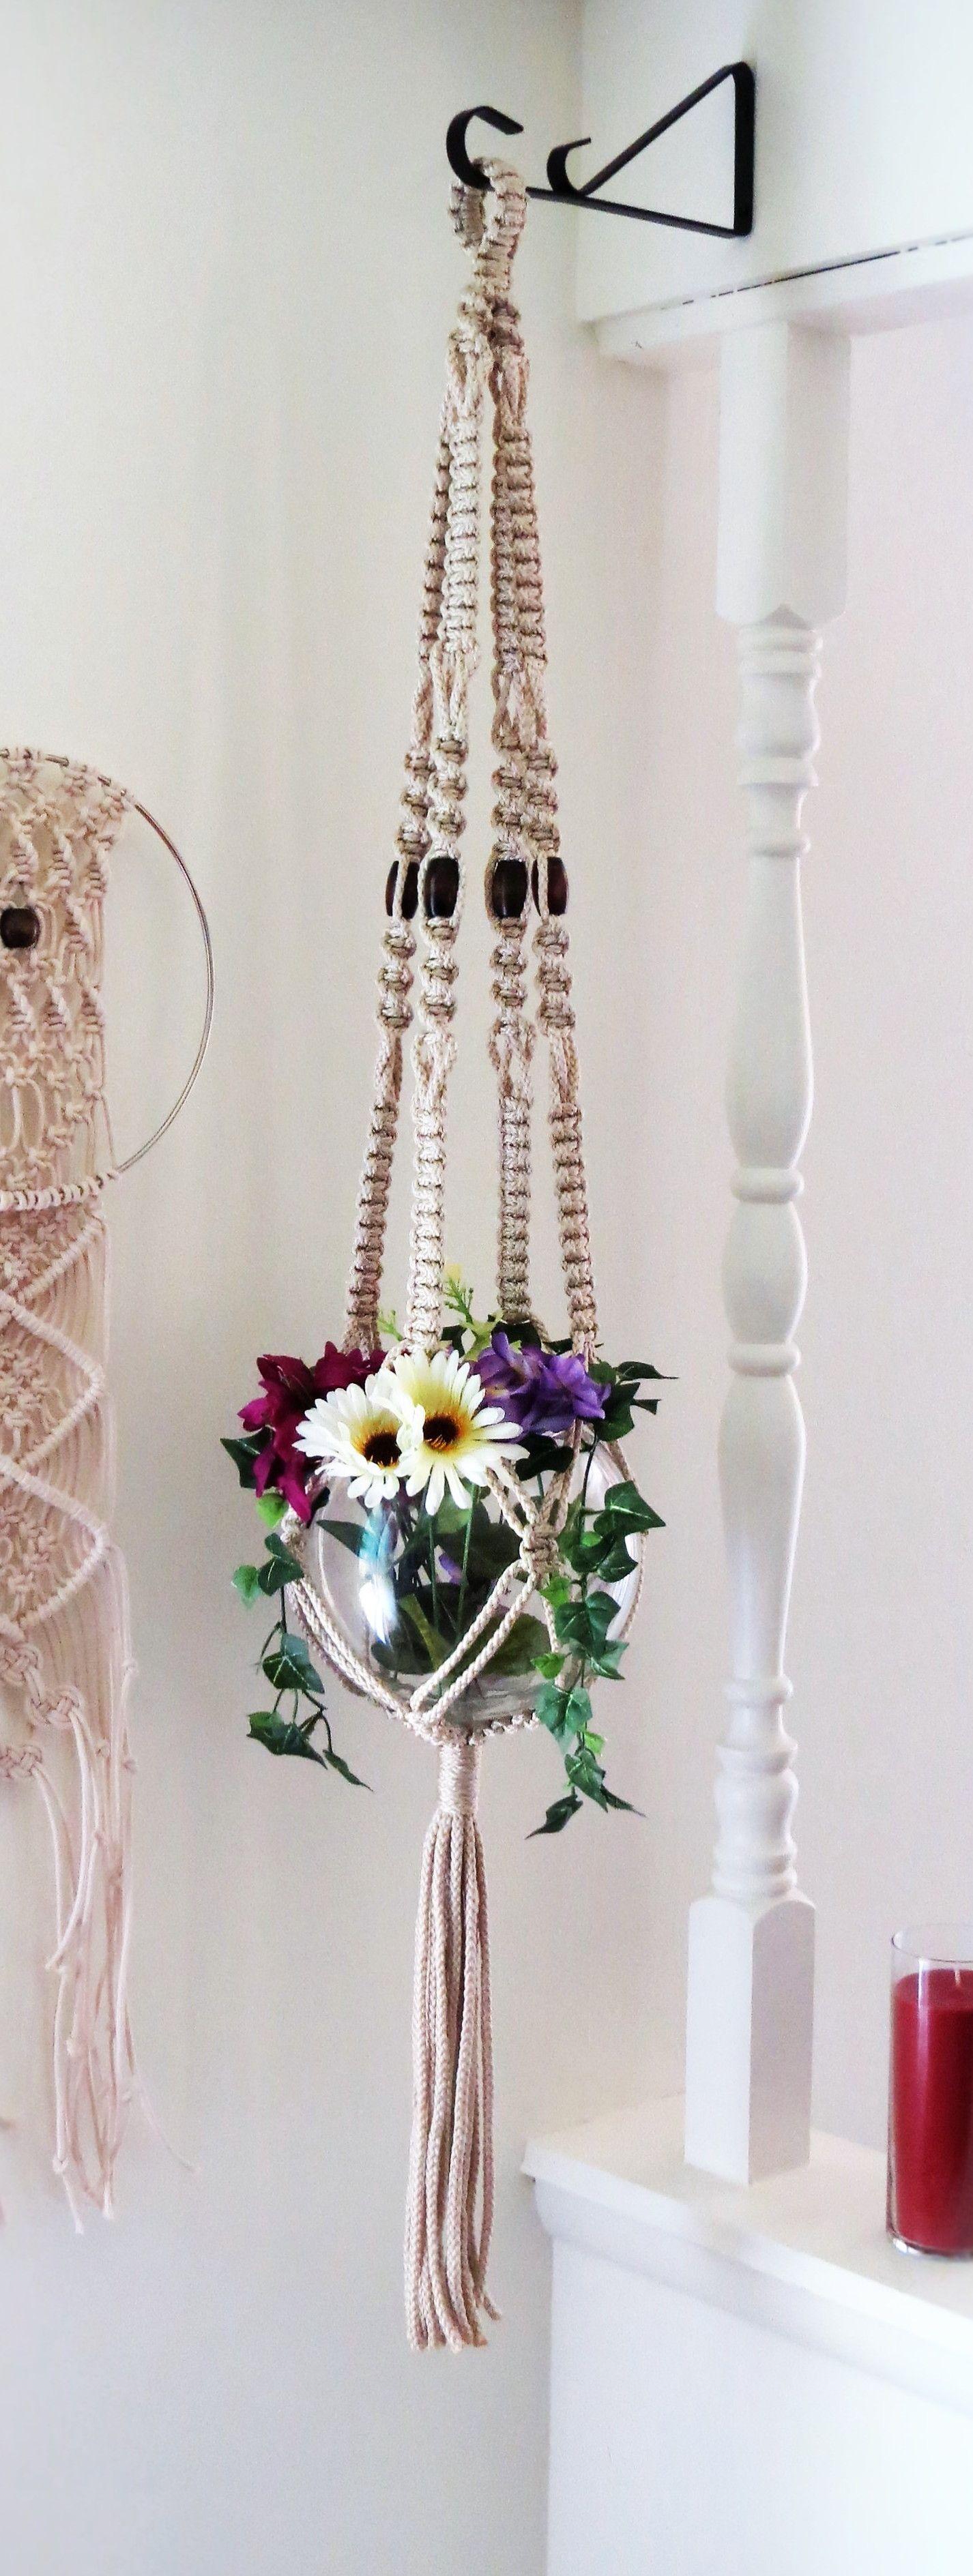 Rustic Flower Pot Holder